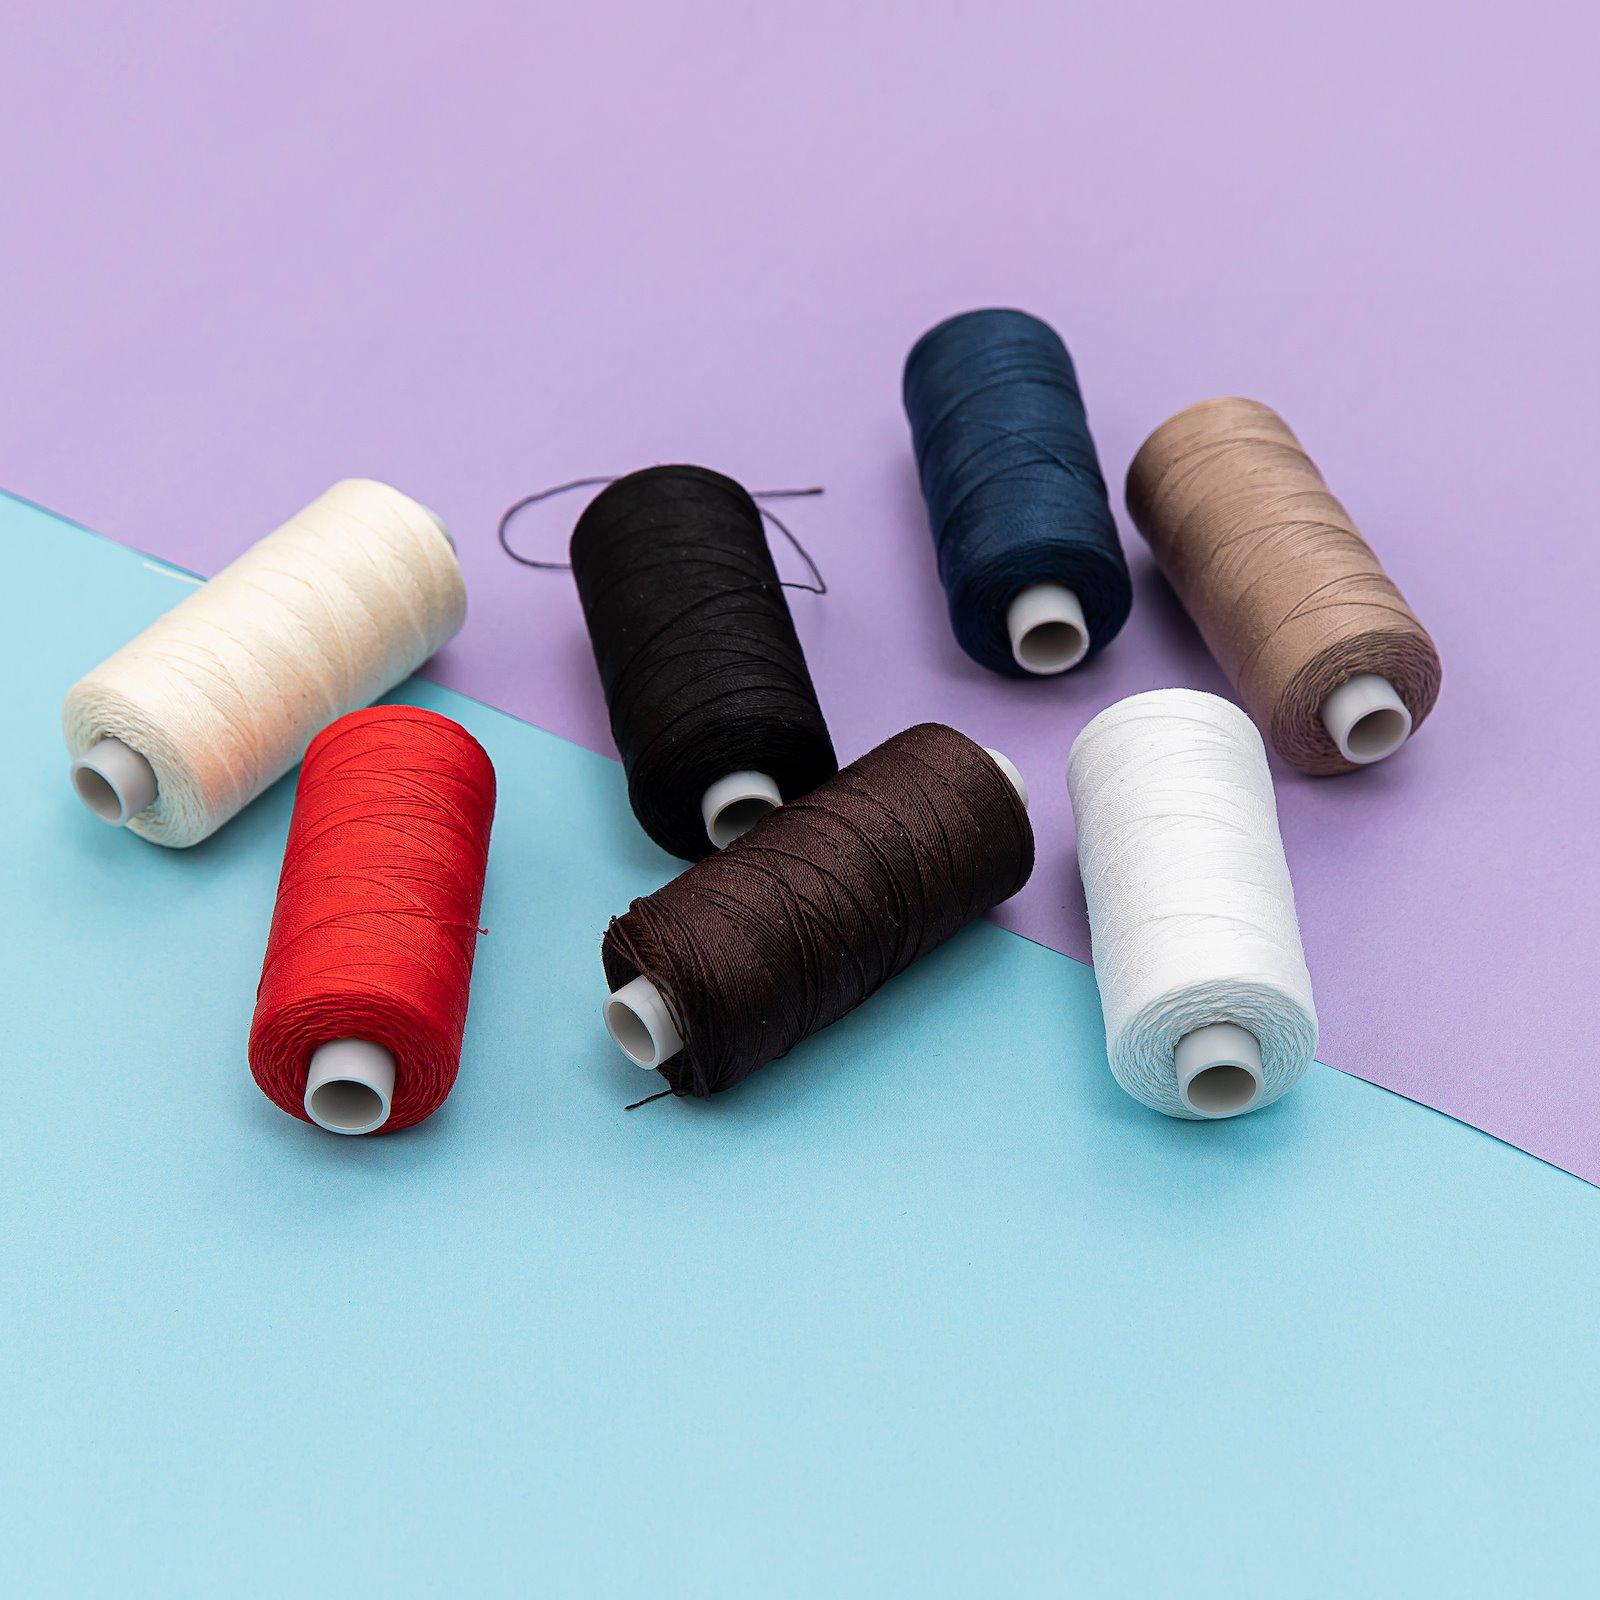 Upholstery thread white 300m 16011_16002_16037_16001_16023_16043_16031_16041_bundle